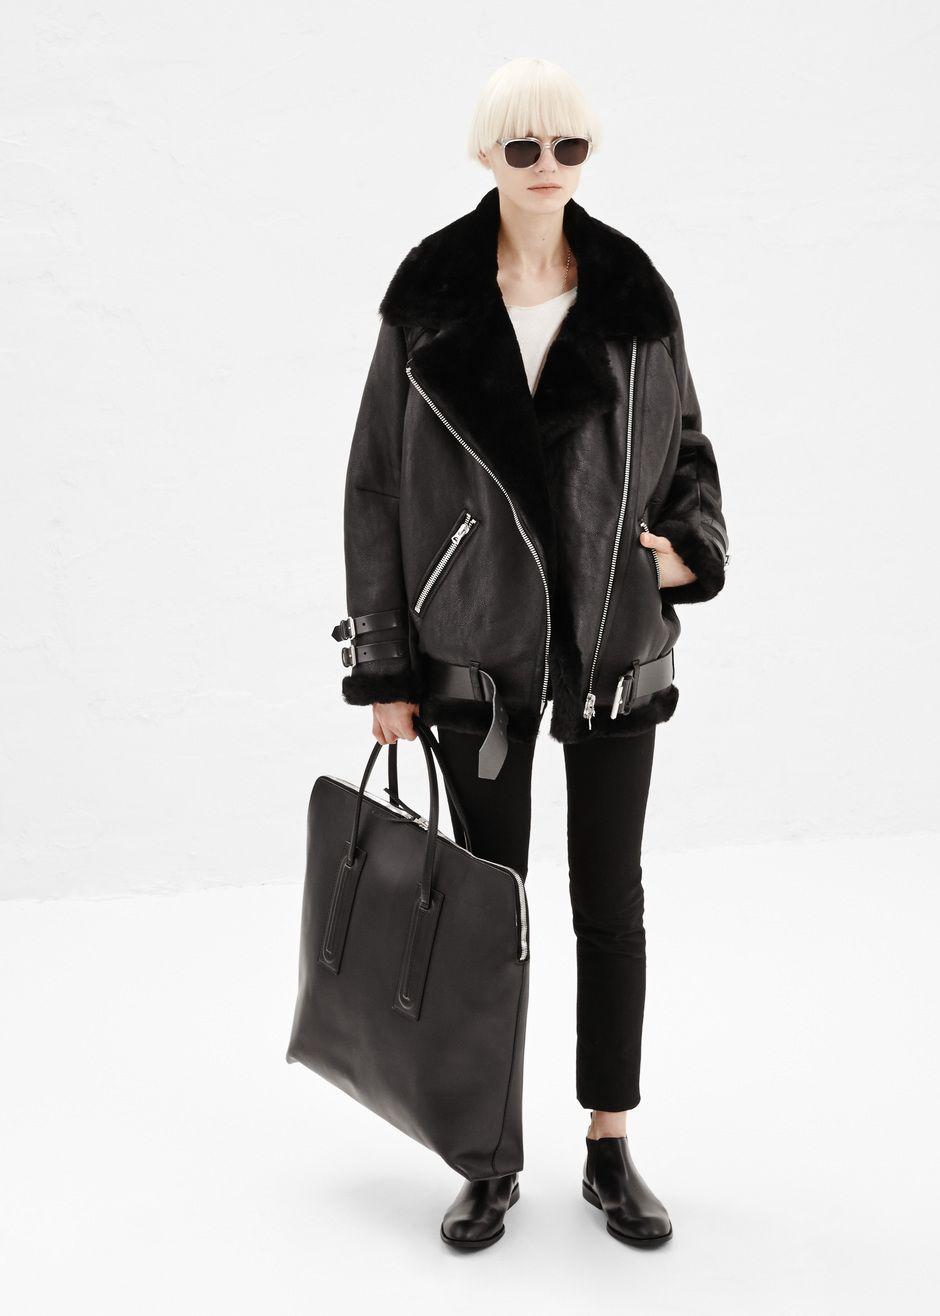 75c560ce202c Acne Studios Velocite Jacket (Black)   Sunghee s stuffs   Pinterest ...